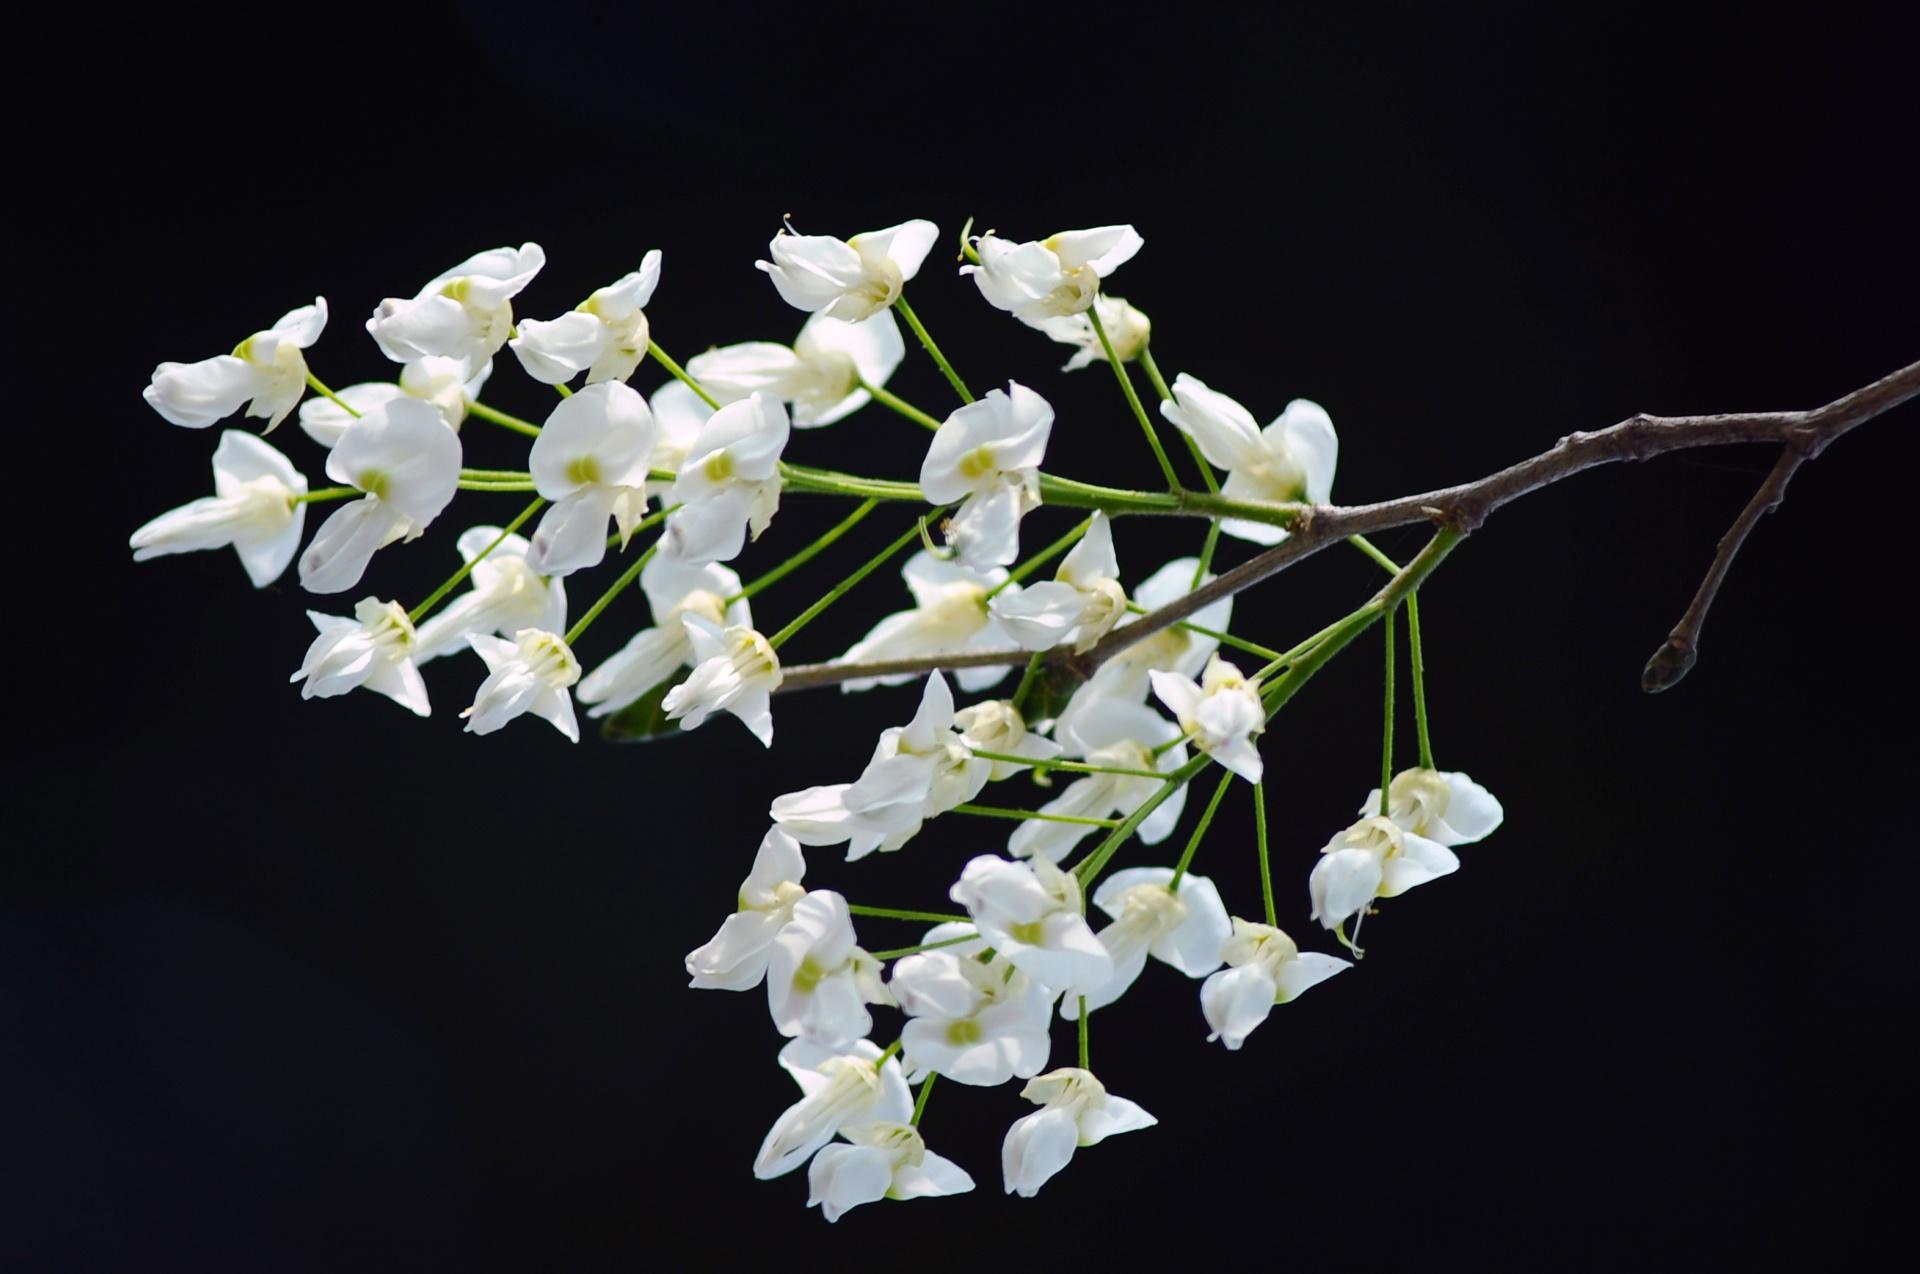 Nhung mua hoa Ha thanh ngap tran cam xuc hinh anh 48